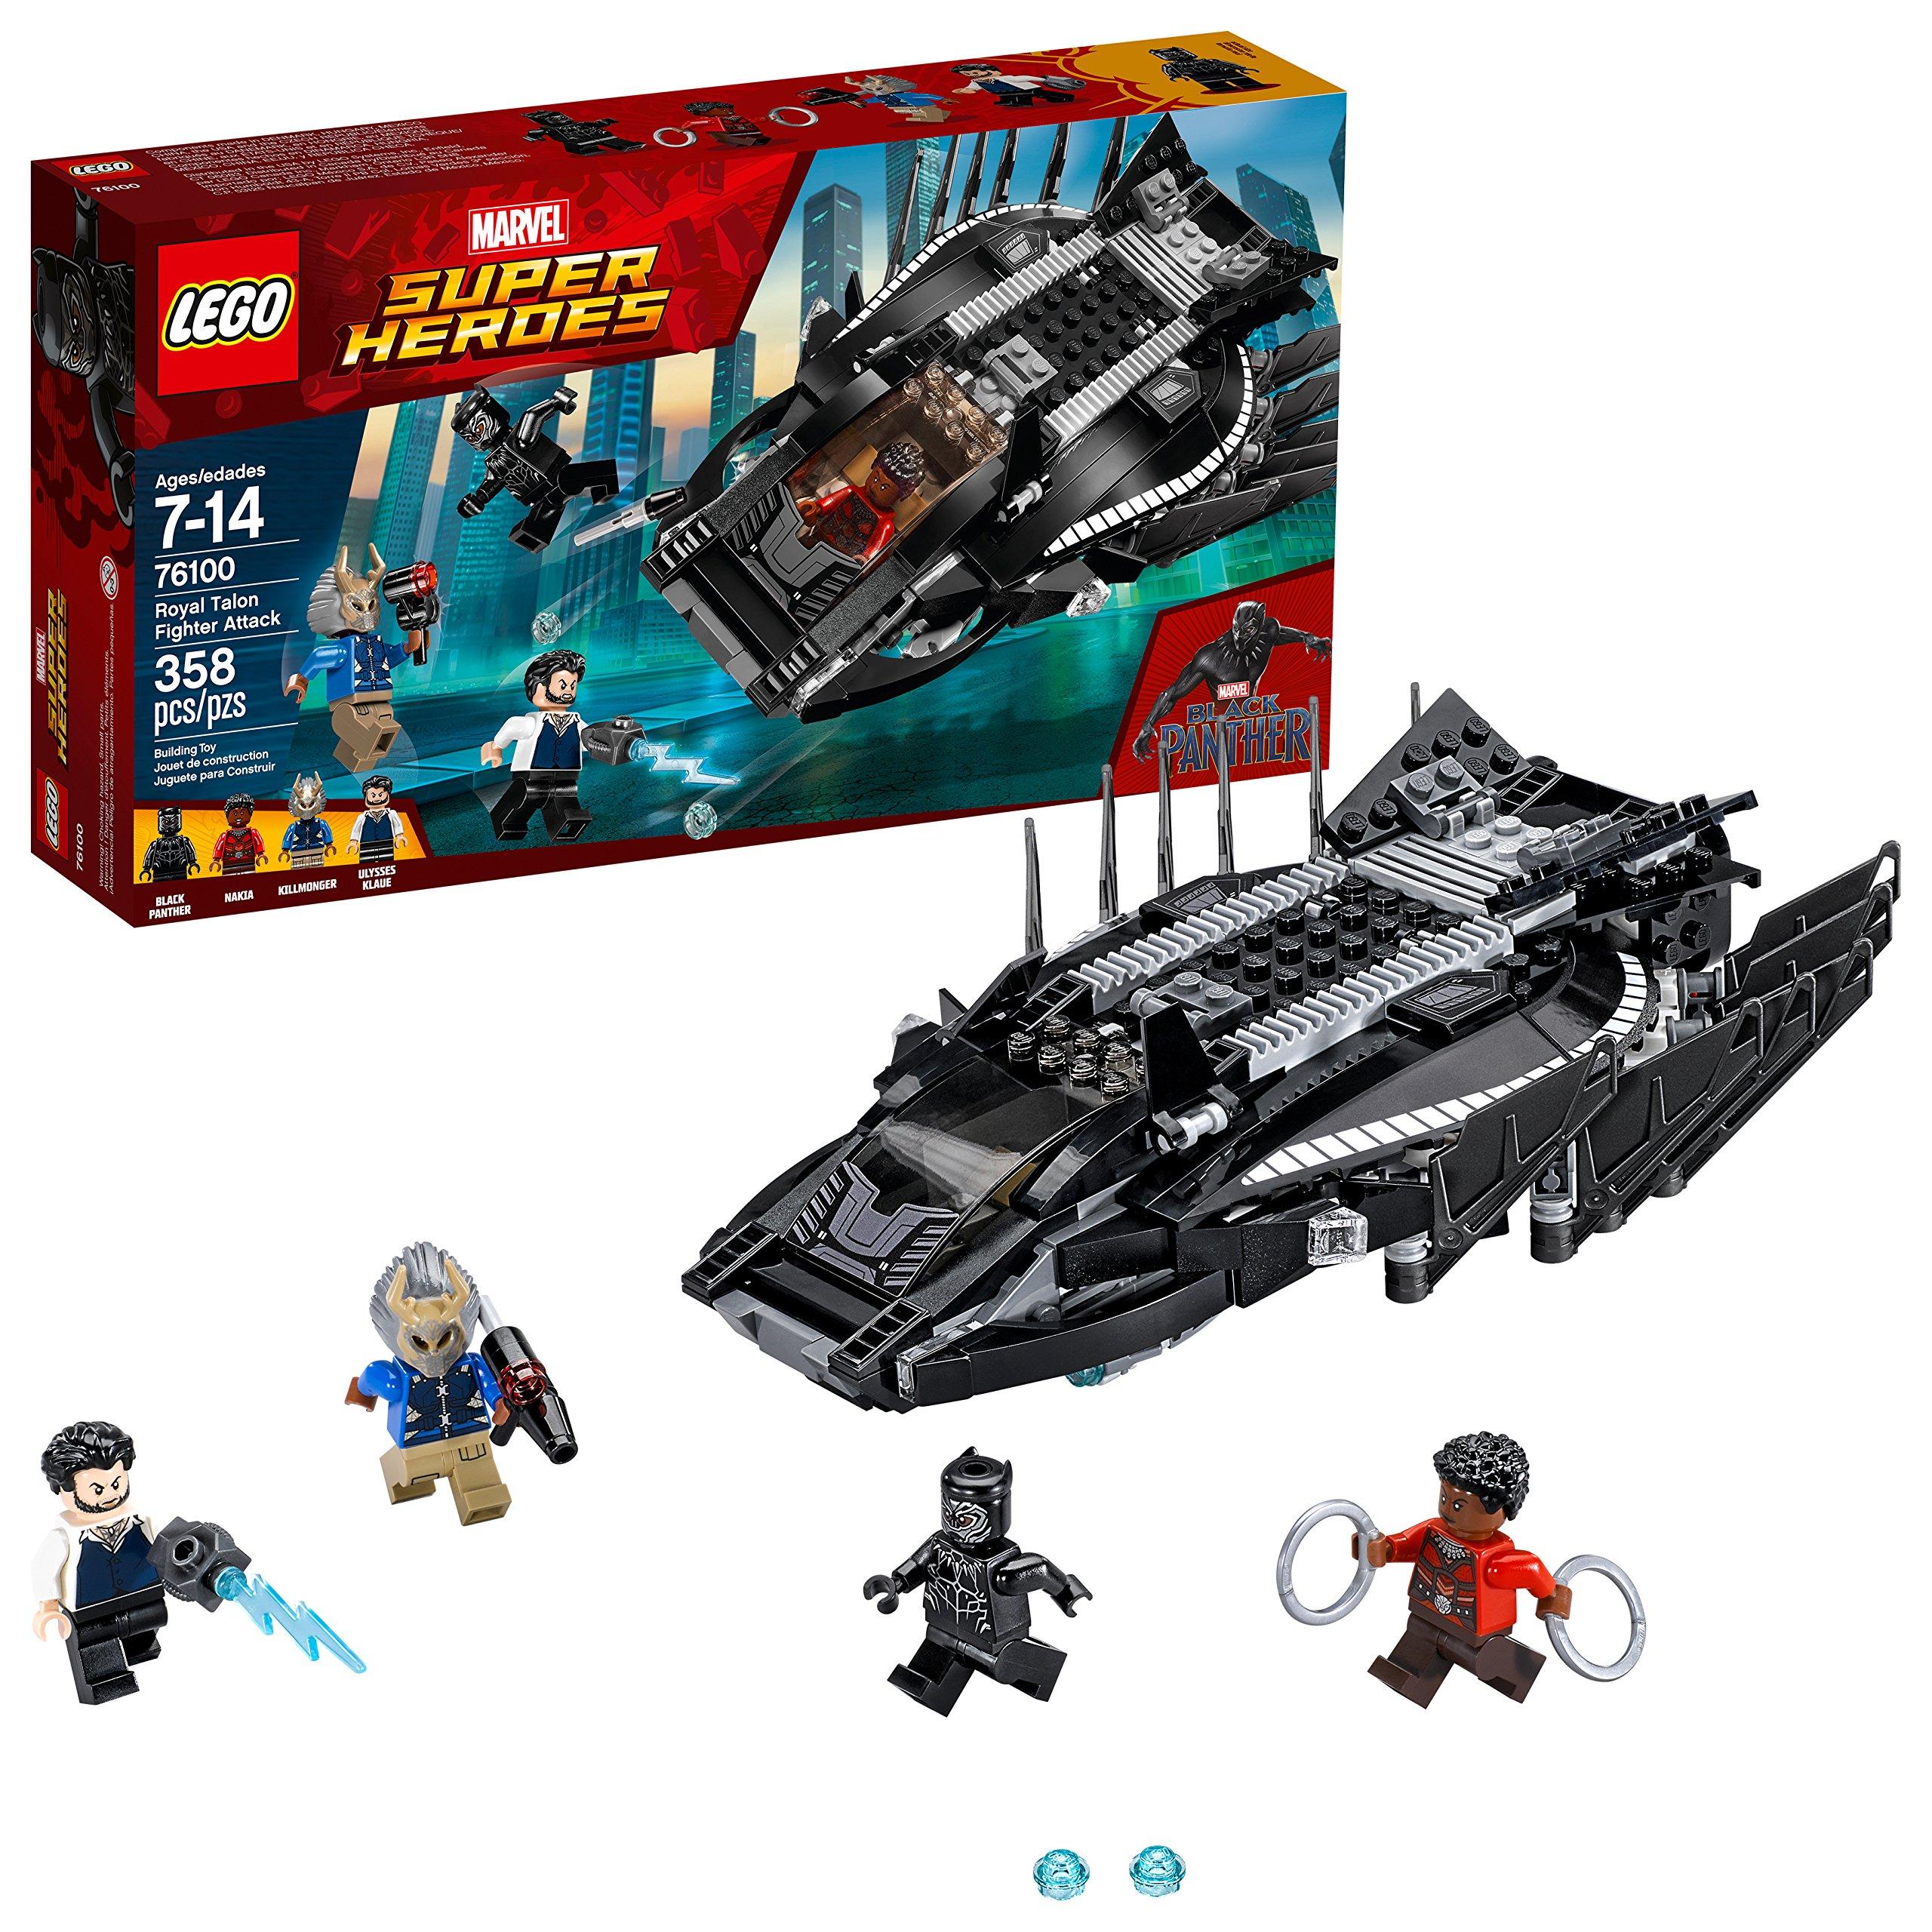 LEGO Marvel Super Heroes Royal Talon Fighter Attack 76100 Building Kit (358 Piece)